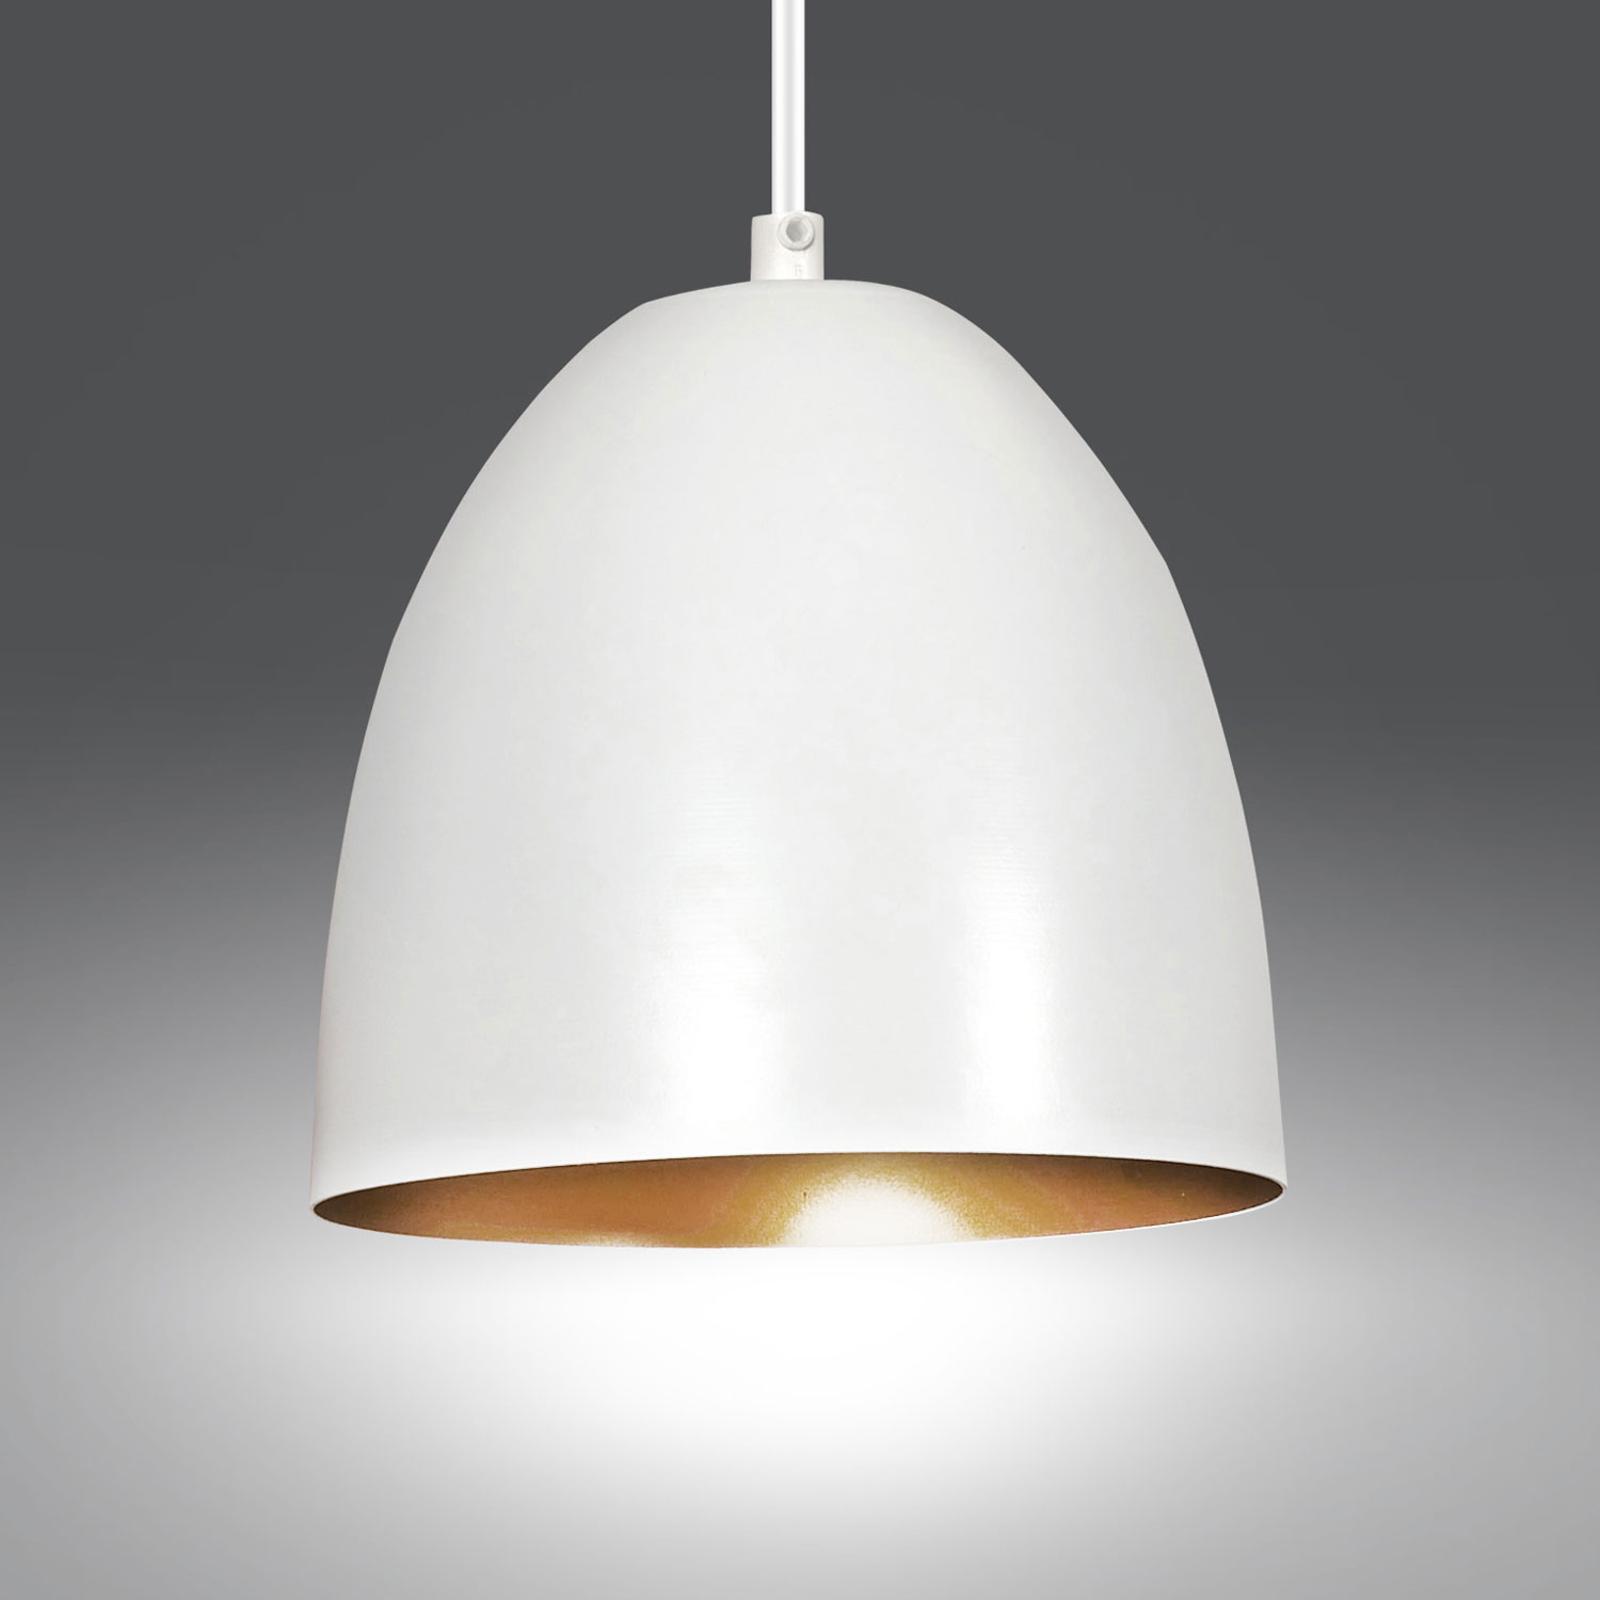 Hanglamp Lenox van staal, 1-lamp, wit/goud